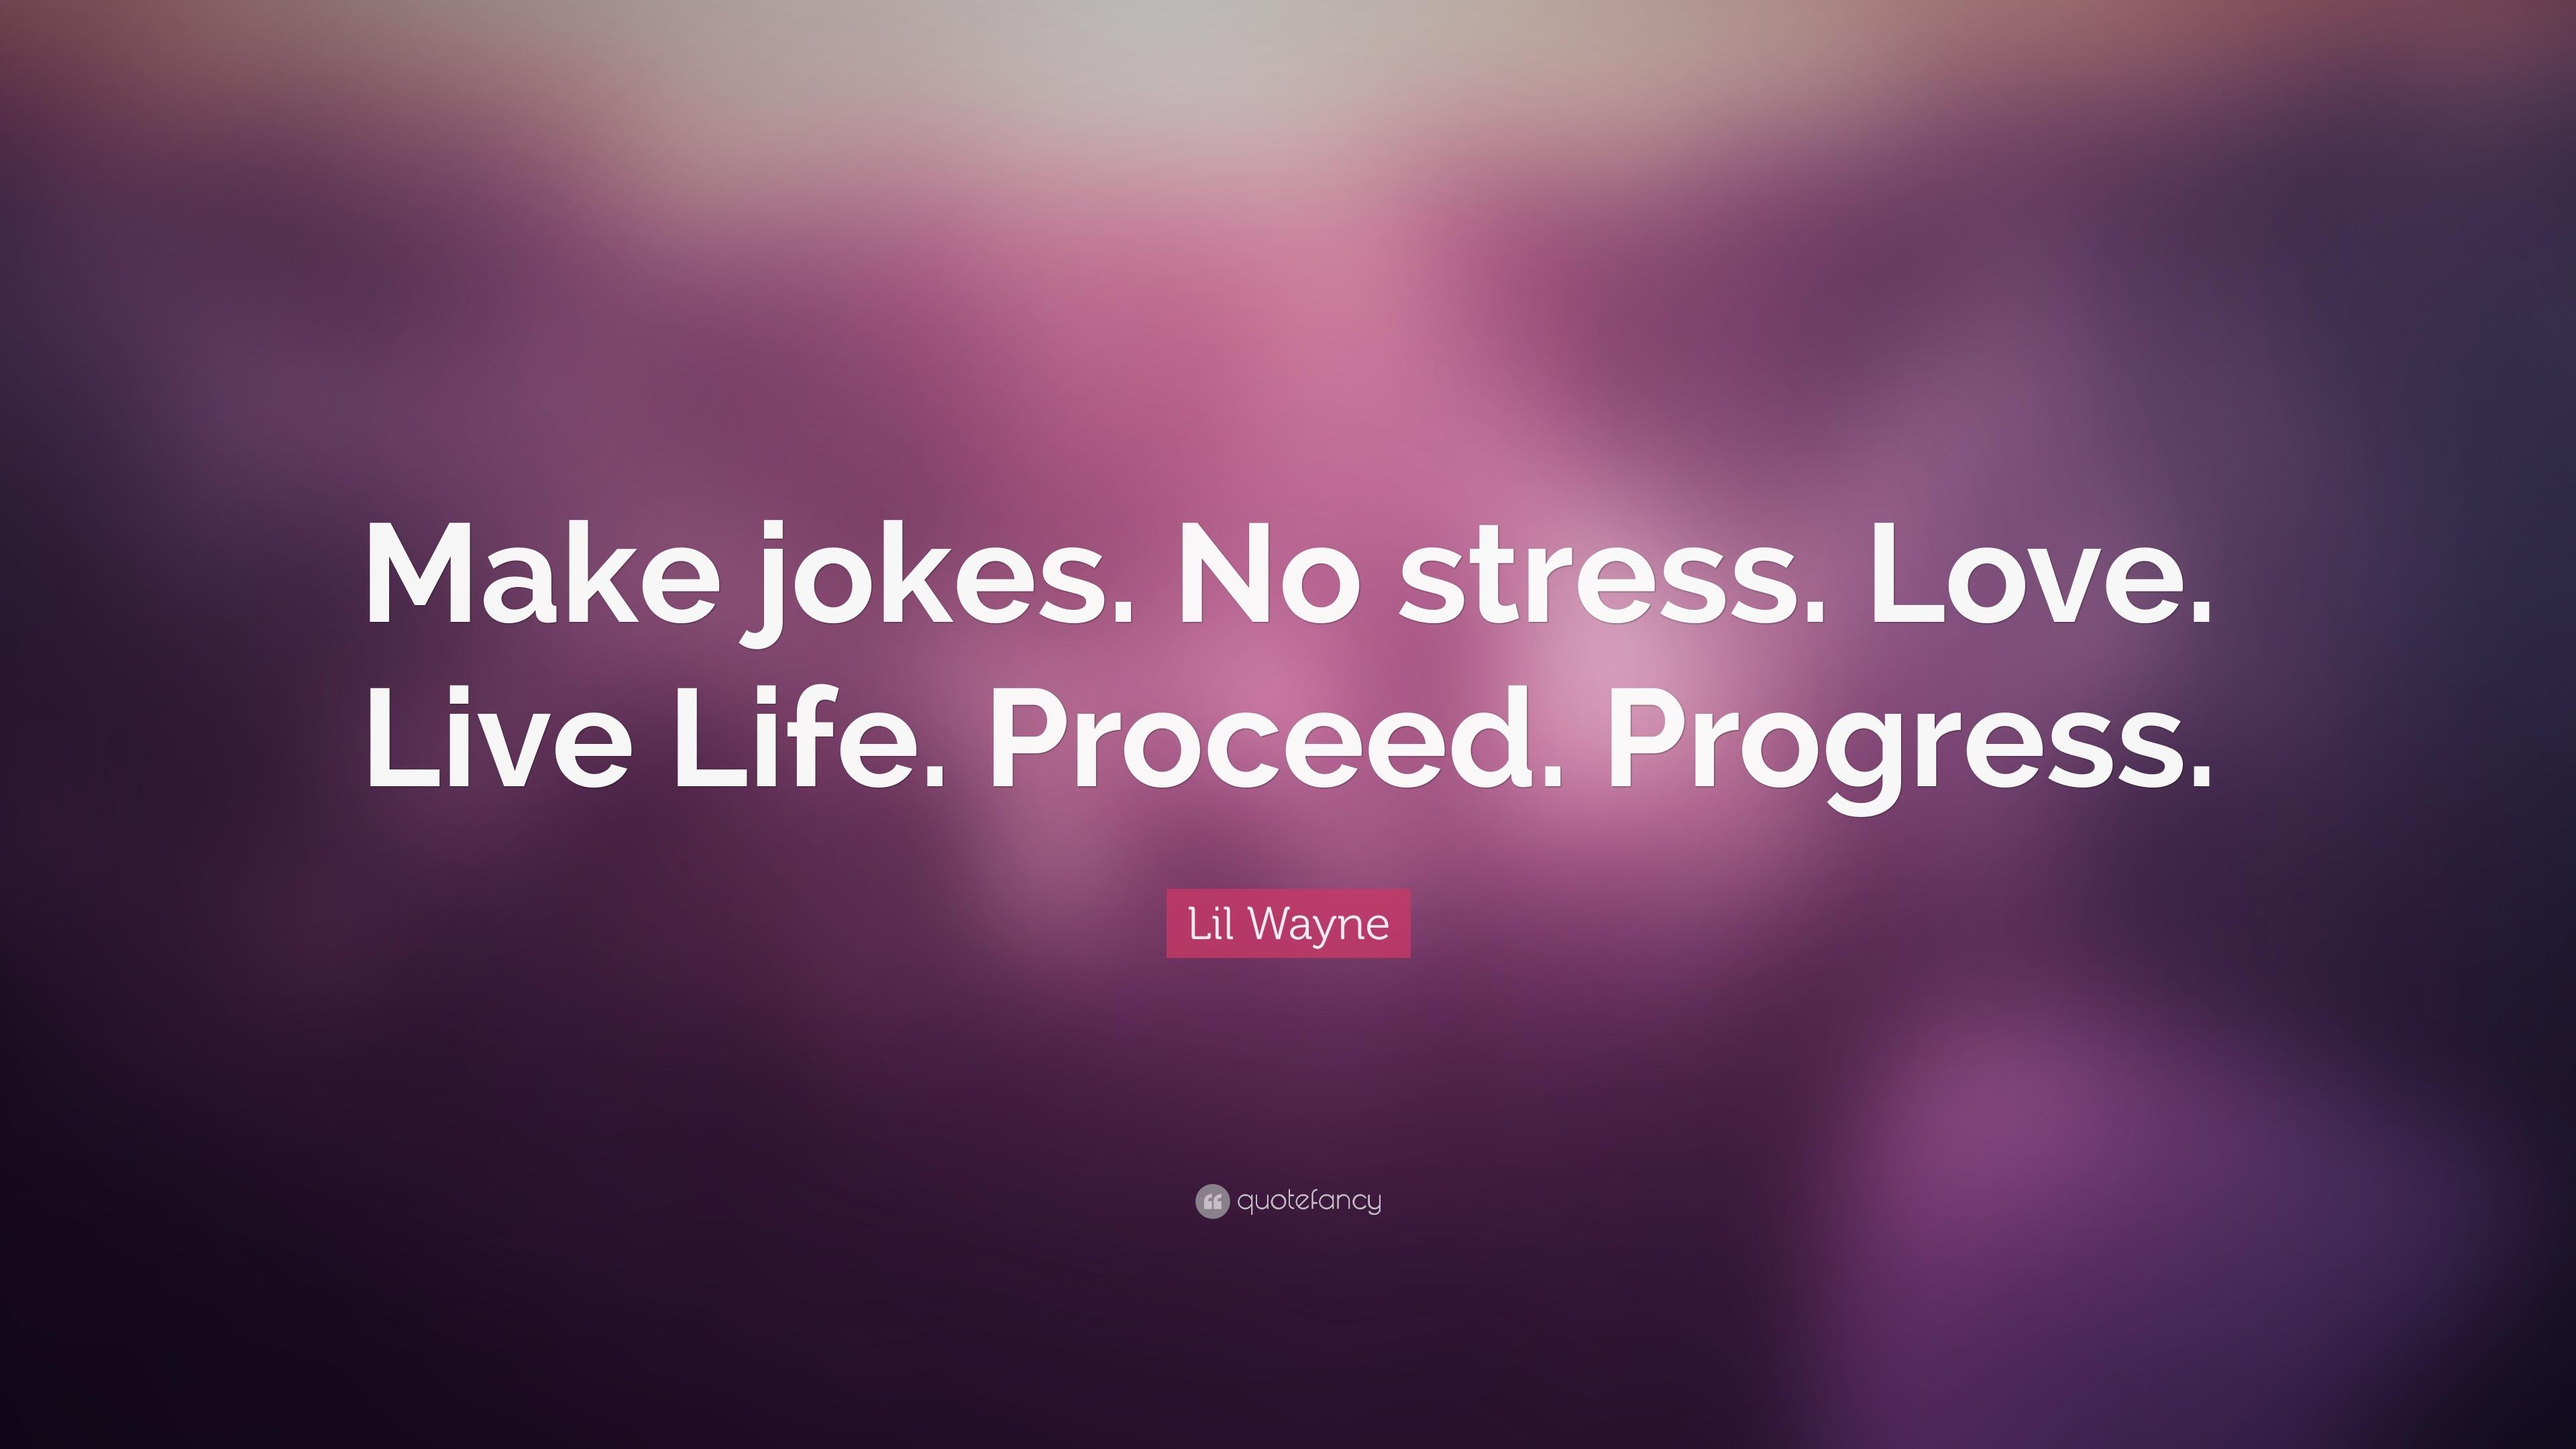 Make jokes no stress love live life proceed progress quote nude photos